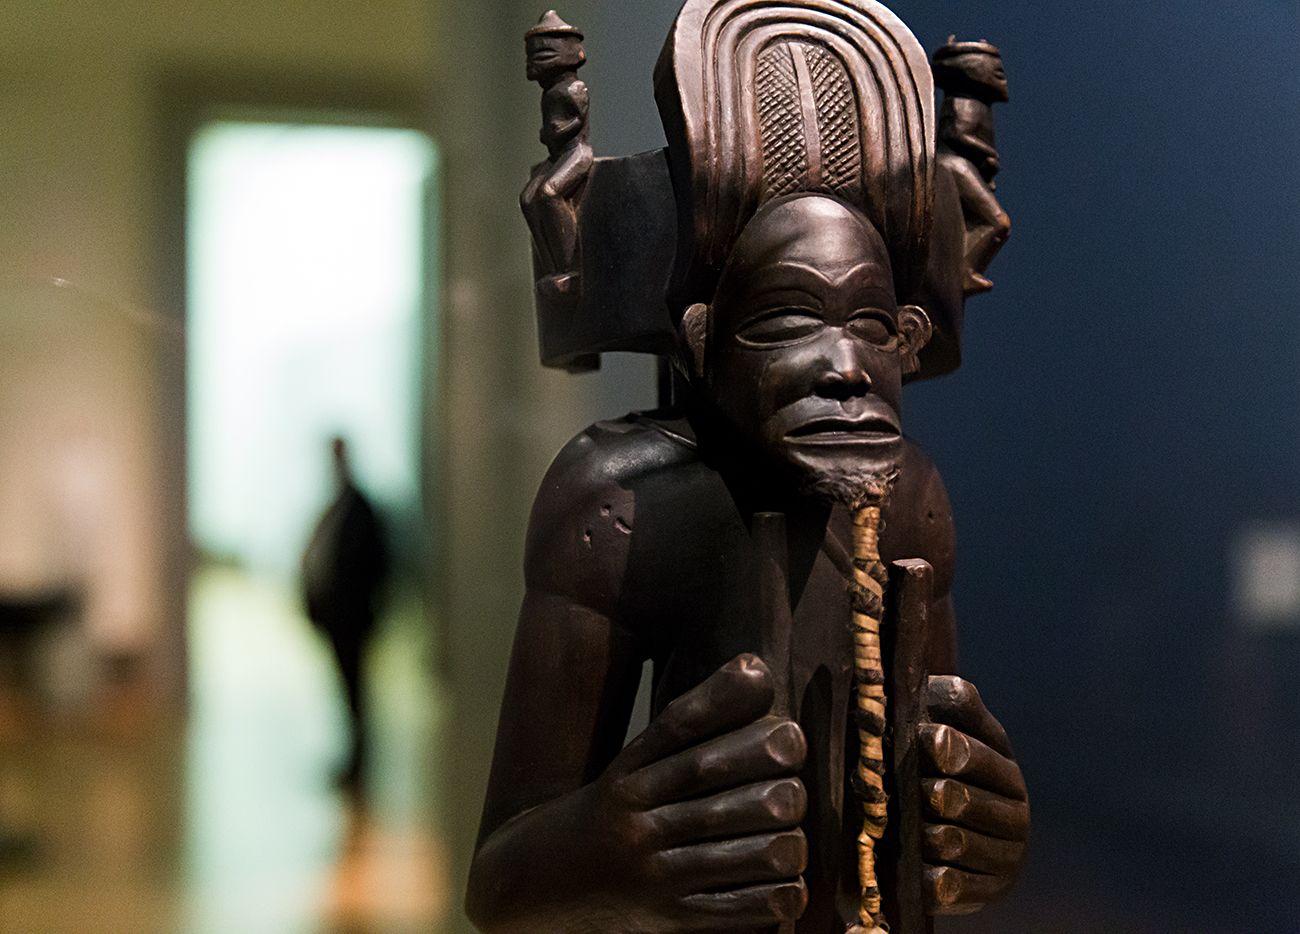 Unvergleichlich: Kunst aus Afrika im Bode-Museum. König und Kulturheros Chibinda Ilunga, Chokwe (Angola), 19. Jh.